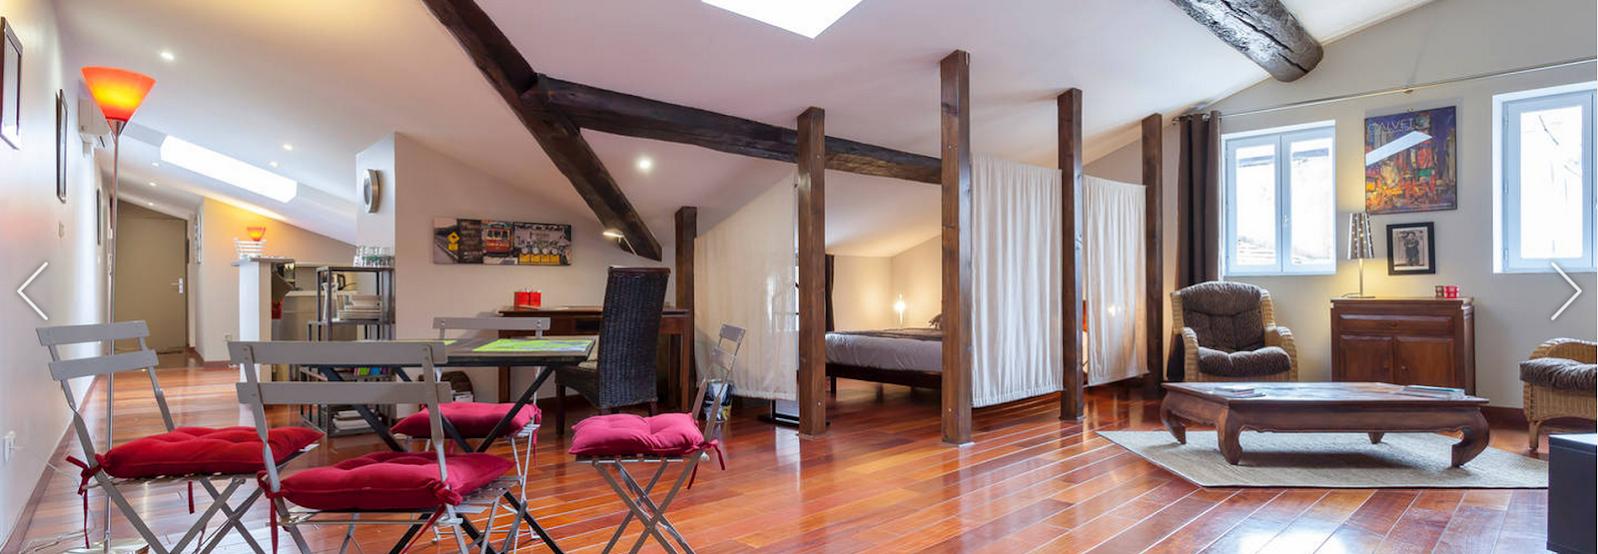 appartement loft meubl lyon. Black Bedroom Furniture Sets. Home Design Ideas